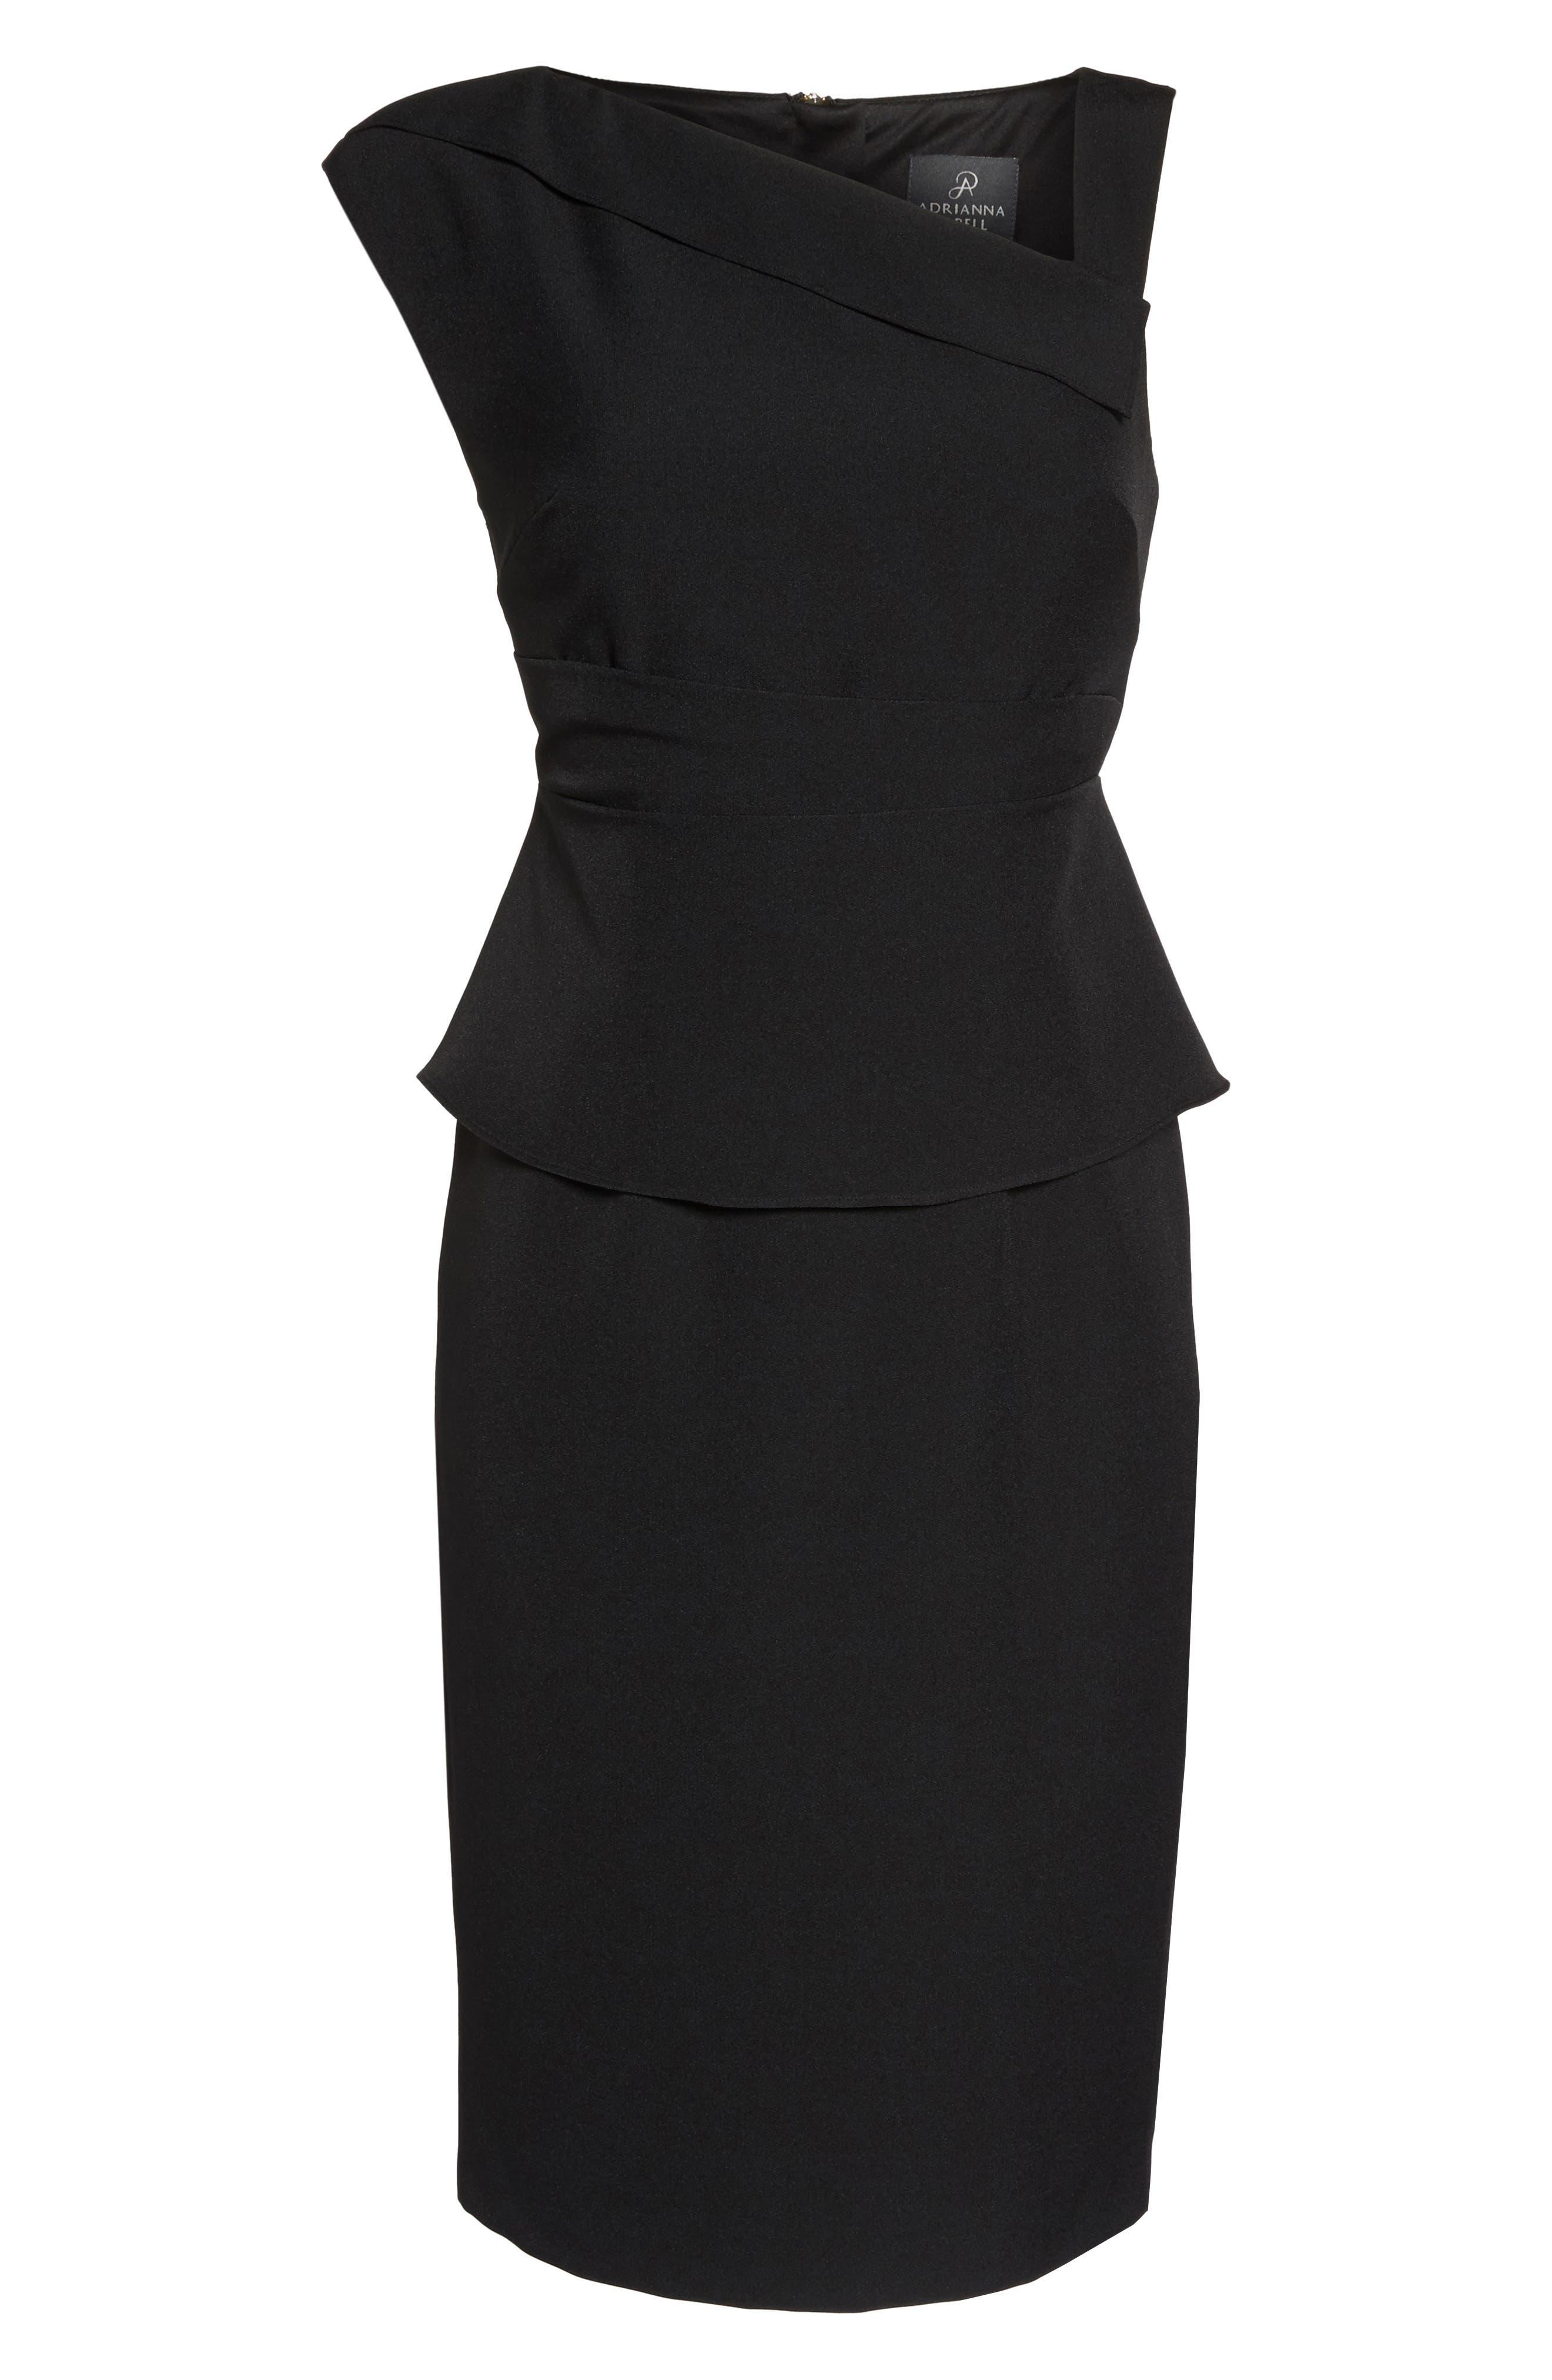 Main Image - Adrianna Papell Crepe Sheath Dress